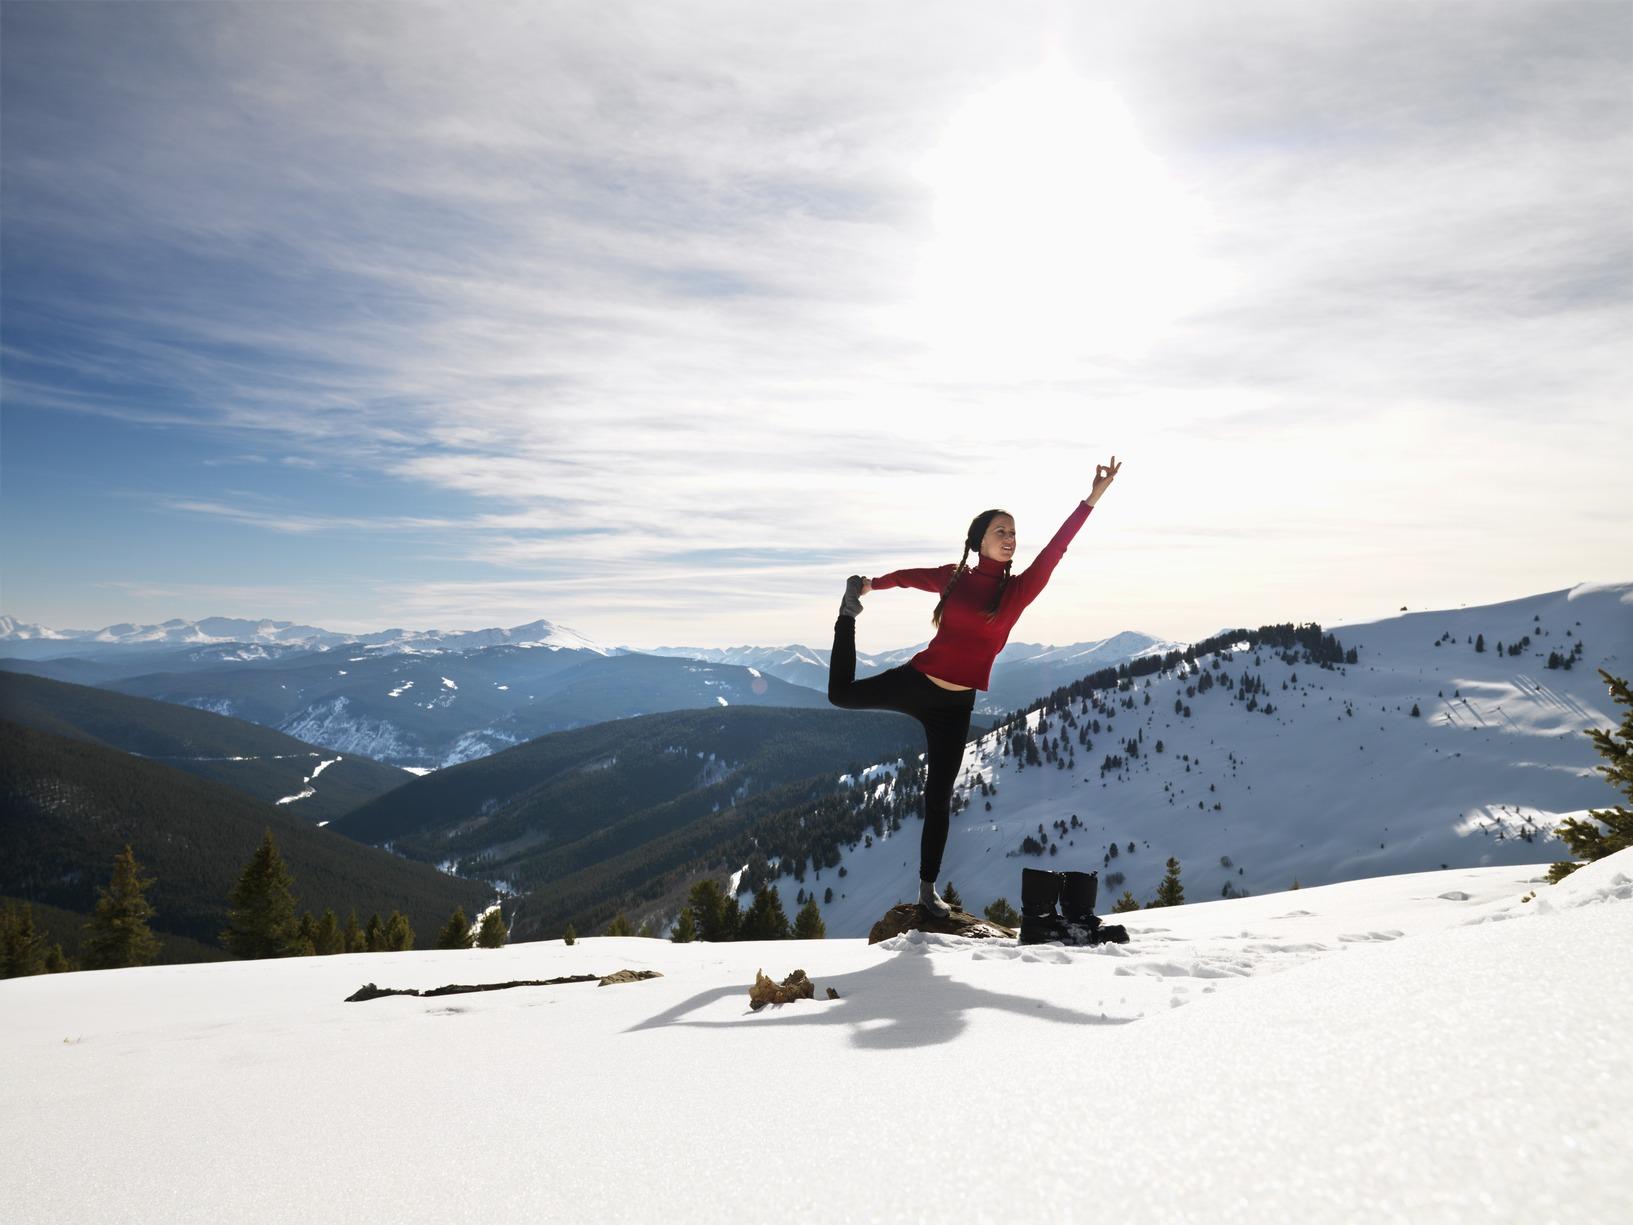 photodune-422340-woman-doing-yoga-in-snow-m.jpg